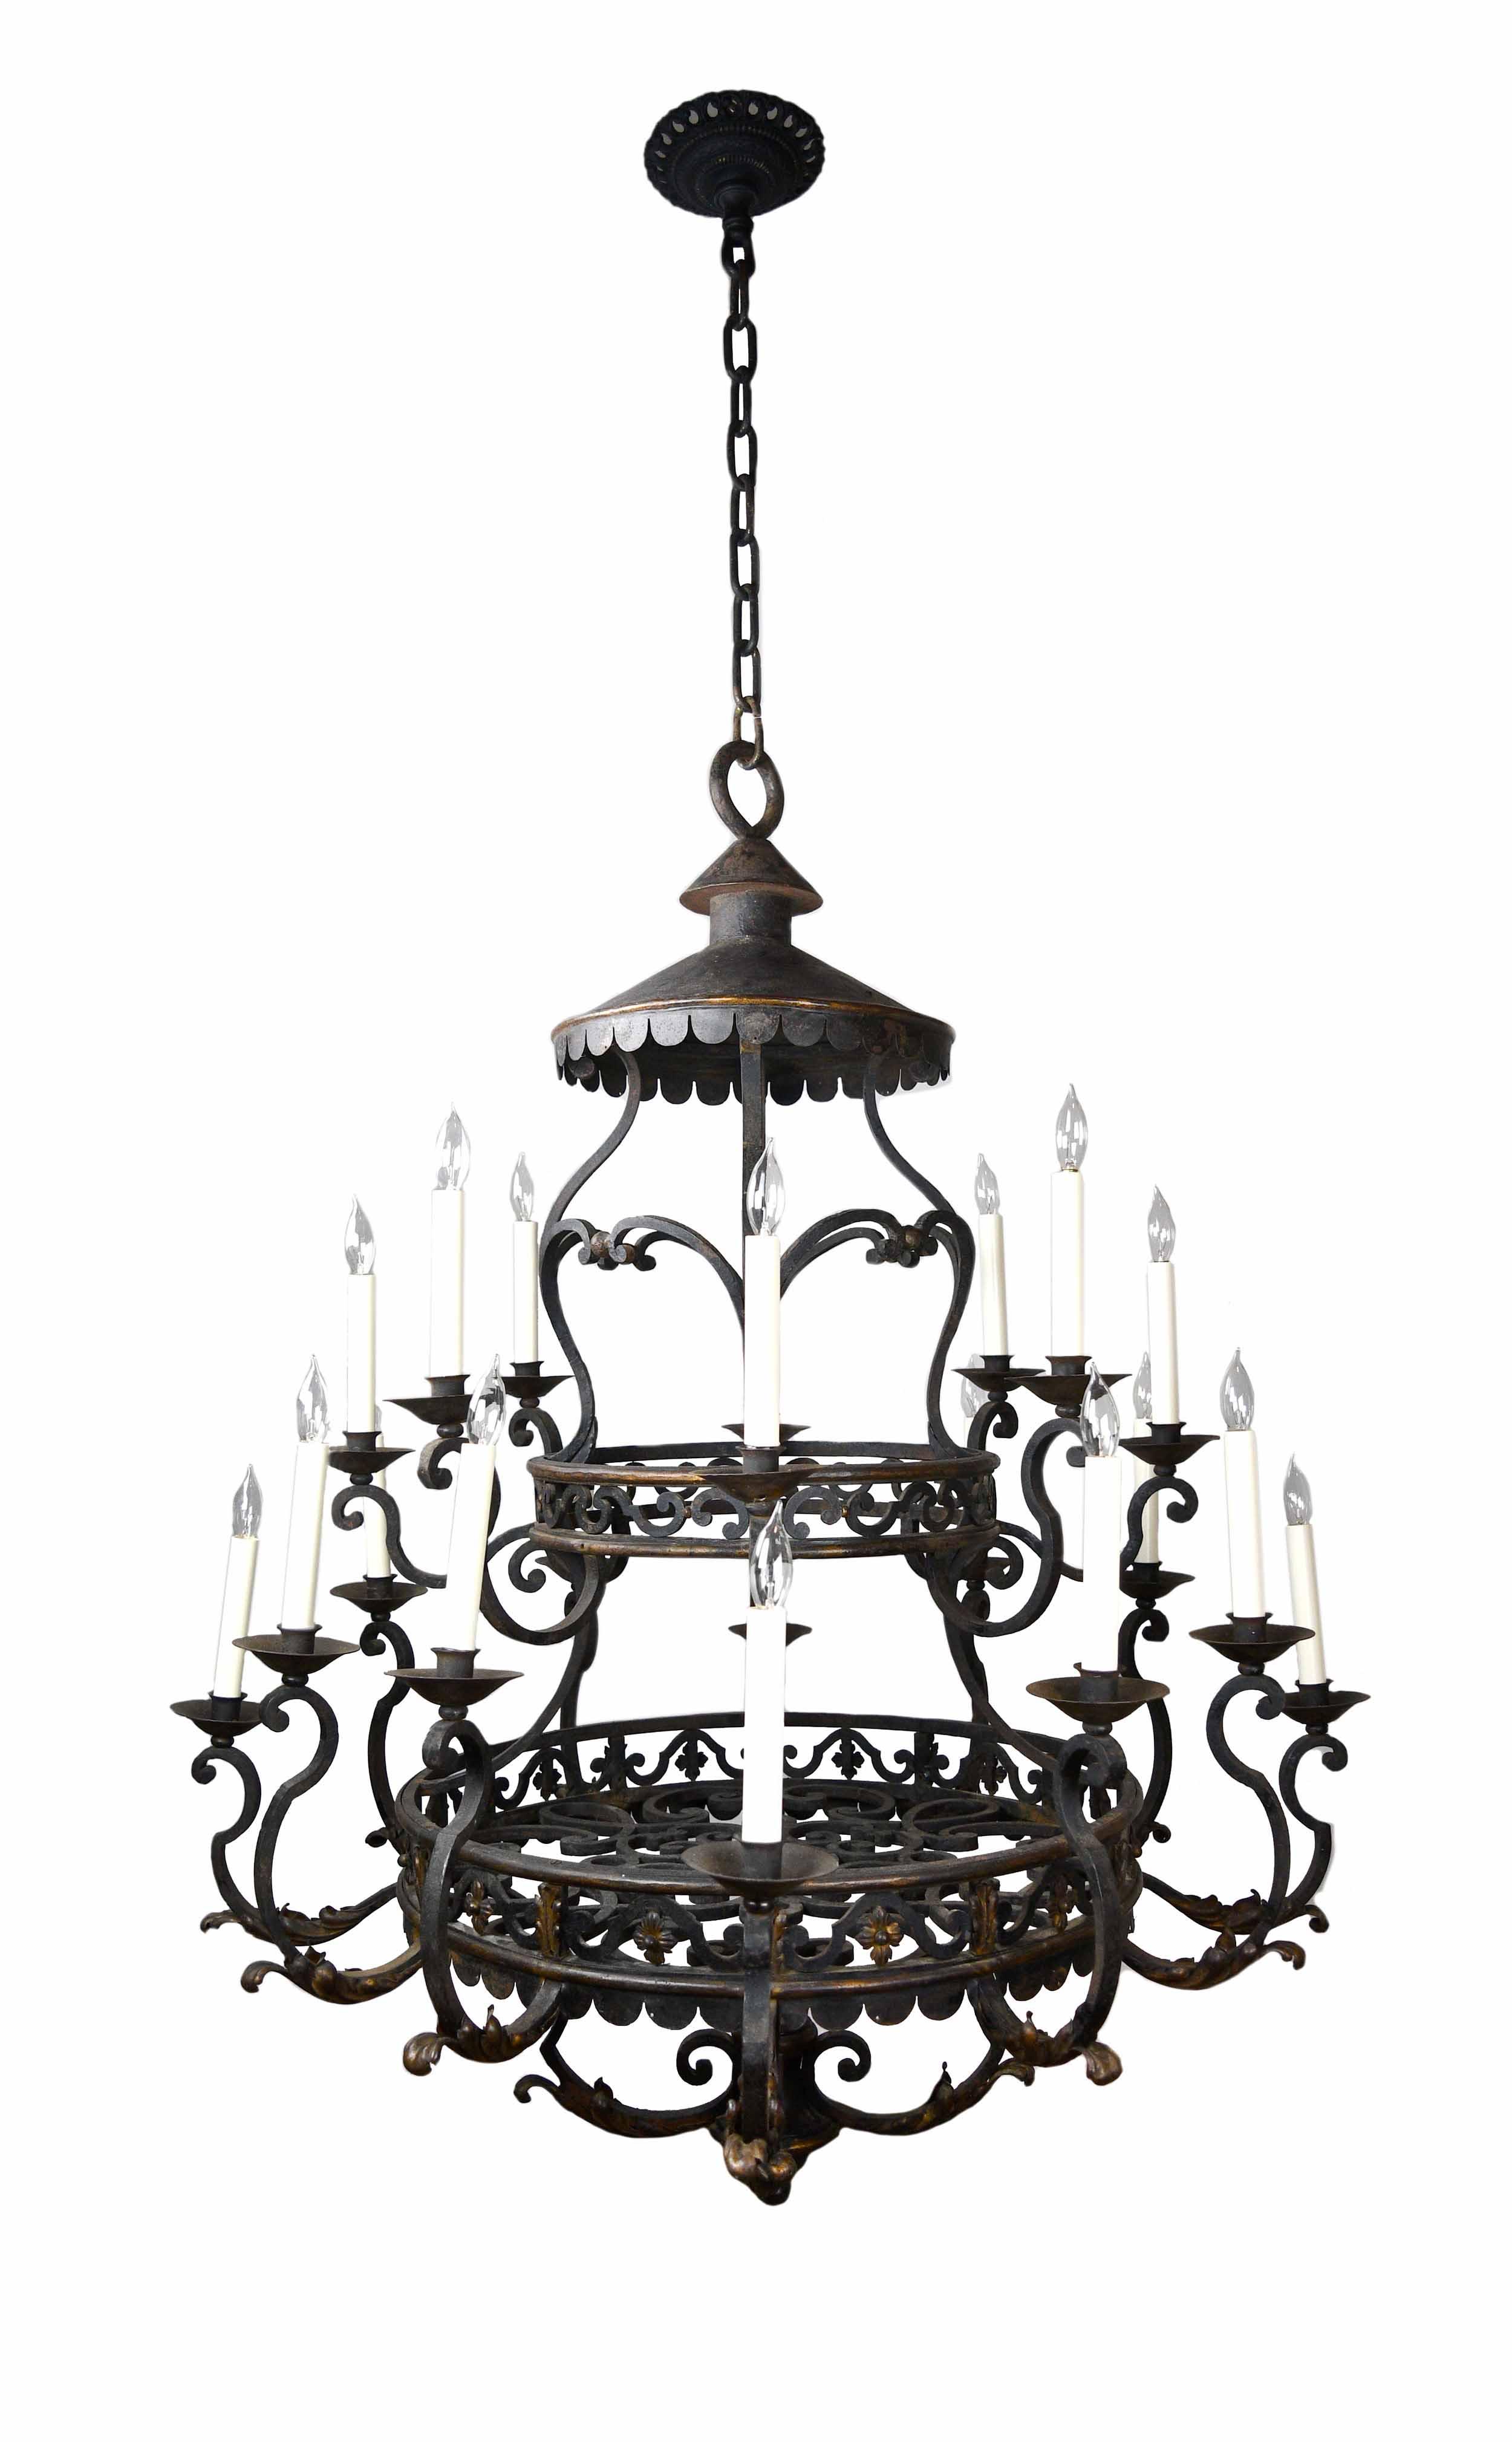 48328-20 candle chandelier-3.jpg